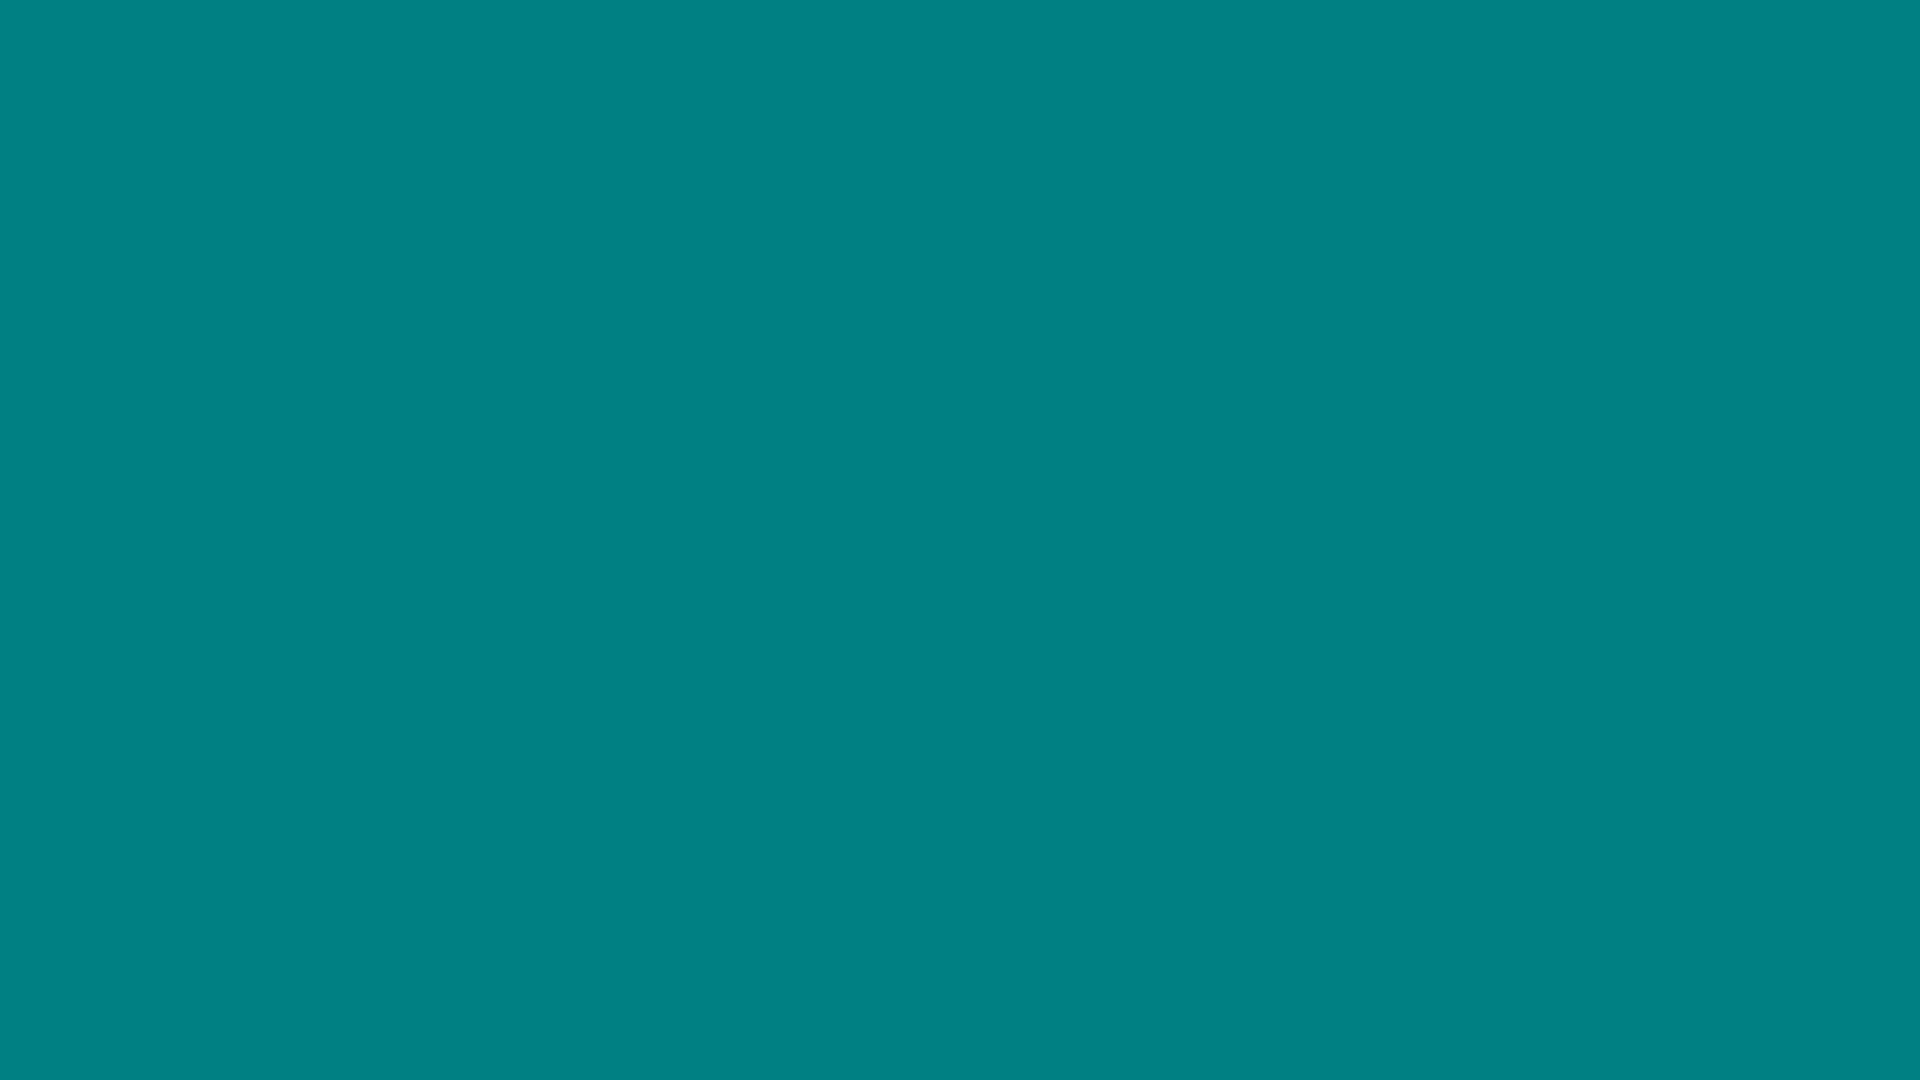 Windows '95 default. (1920×1080)